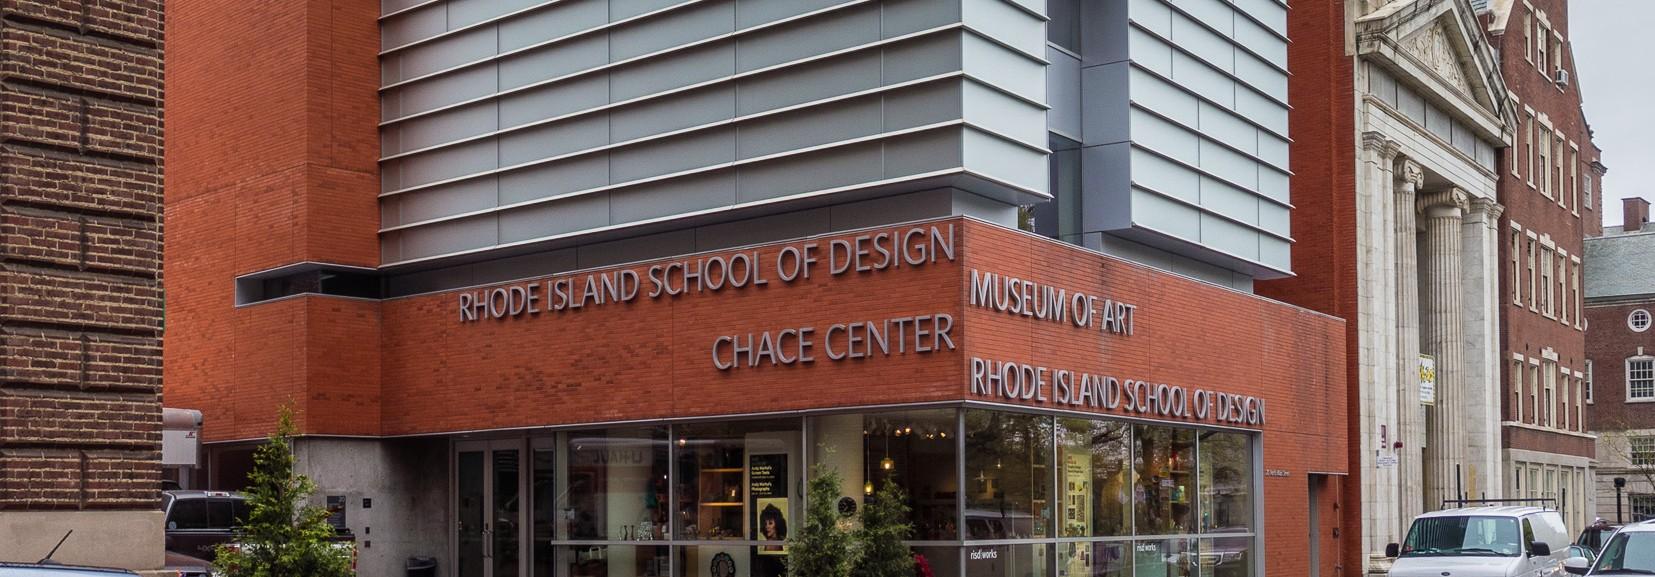 Chace Center, Rhode Island School of Design -